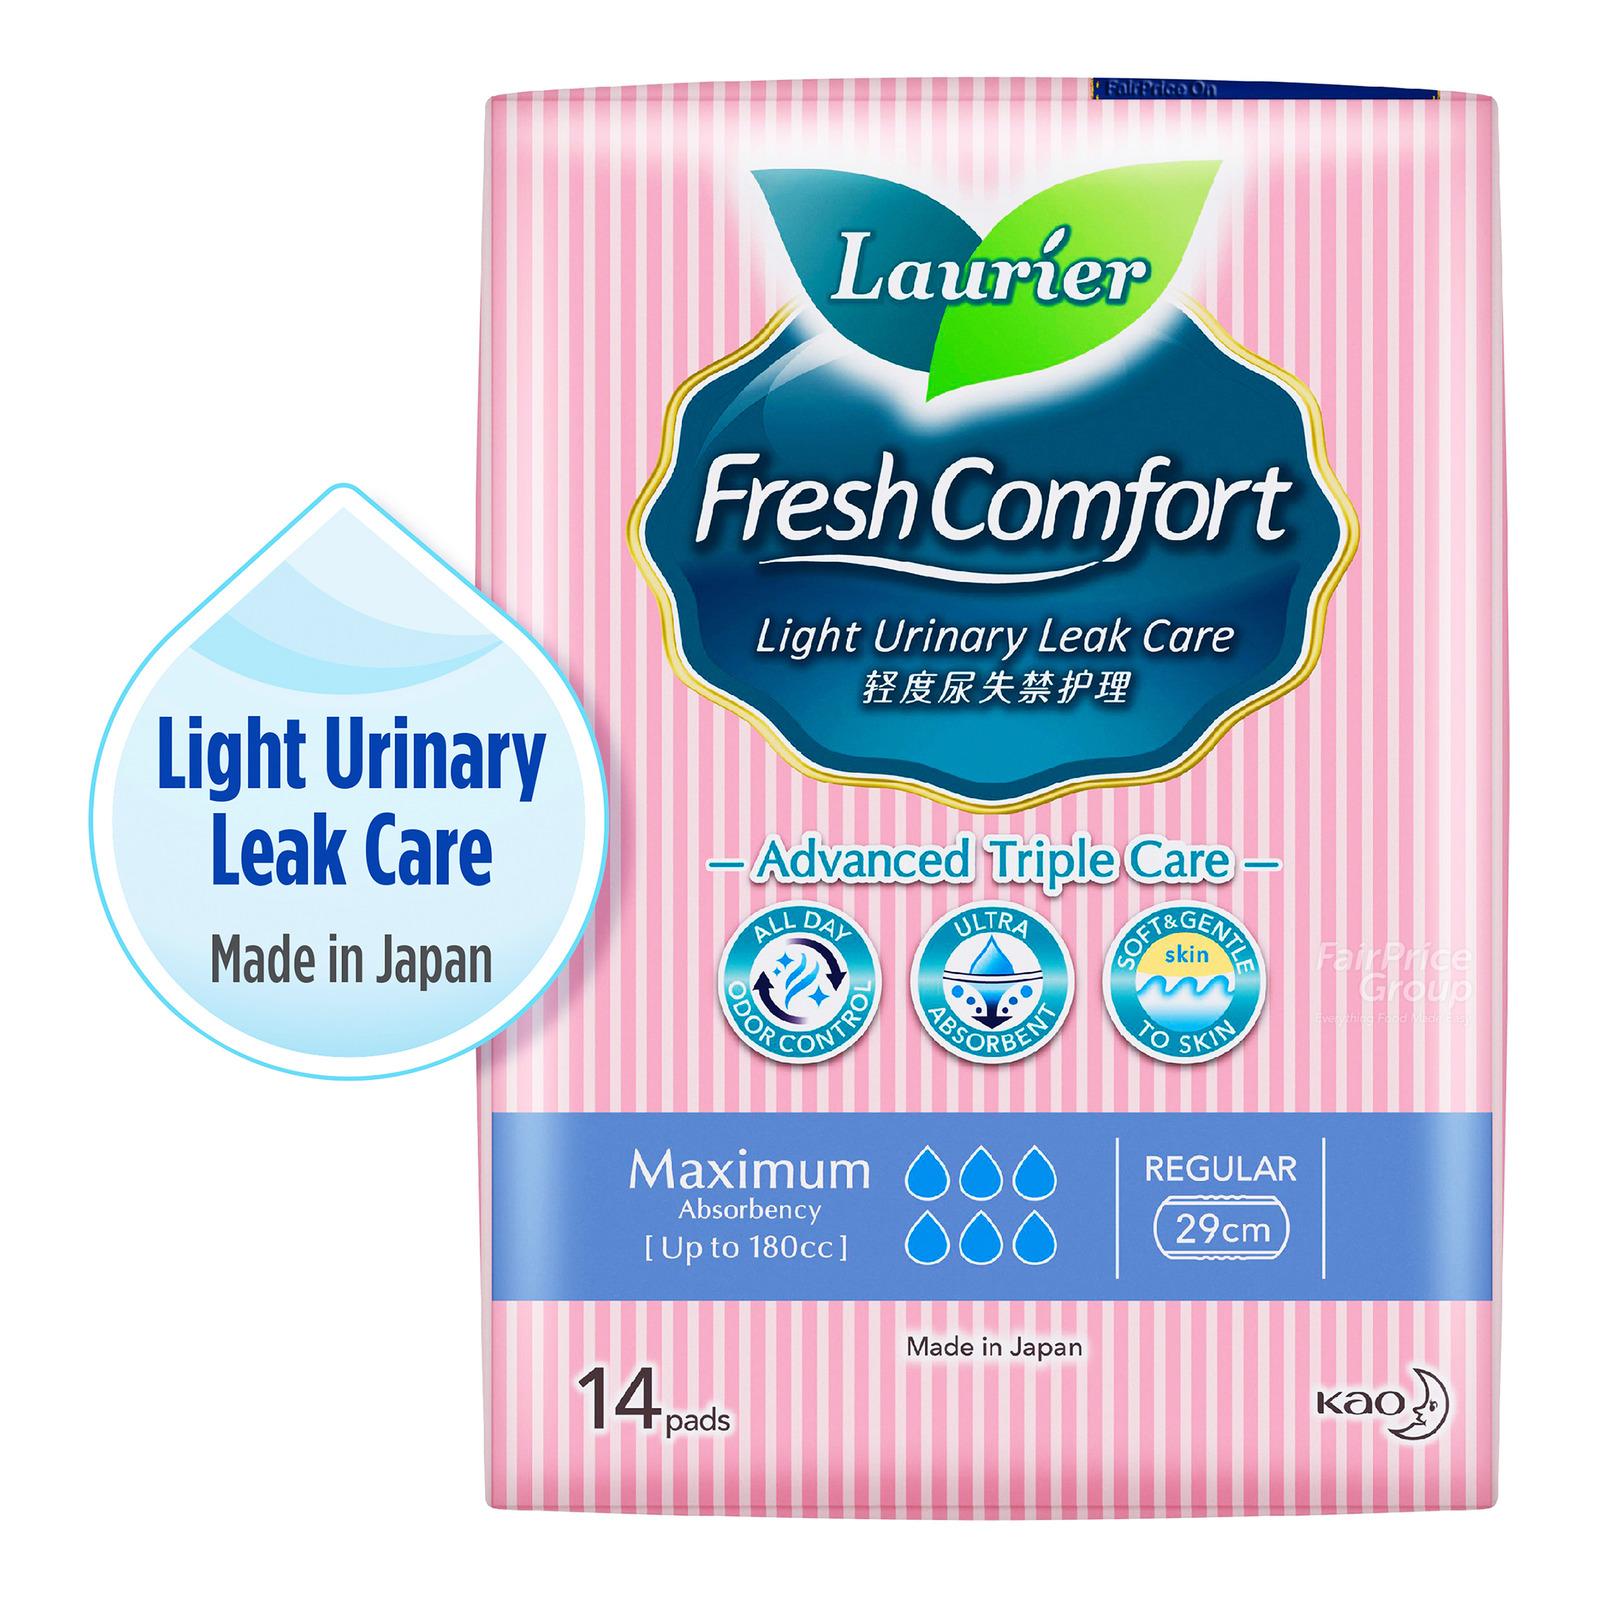 Laurier Fresh Comfort Light Urinary Leak Pads-180cc(29cm)